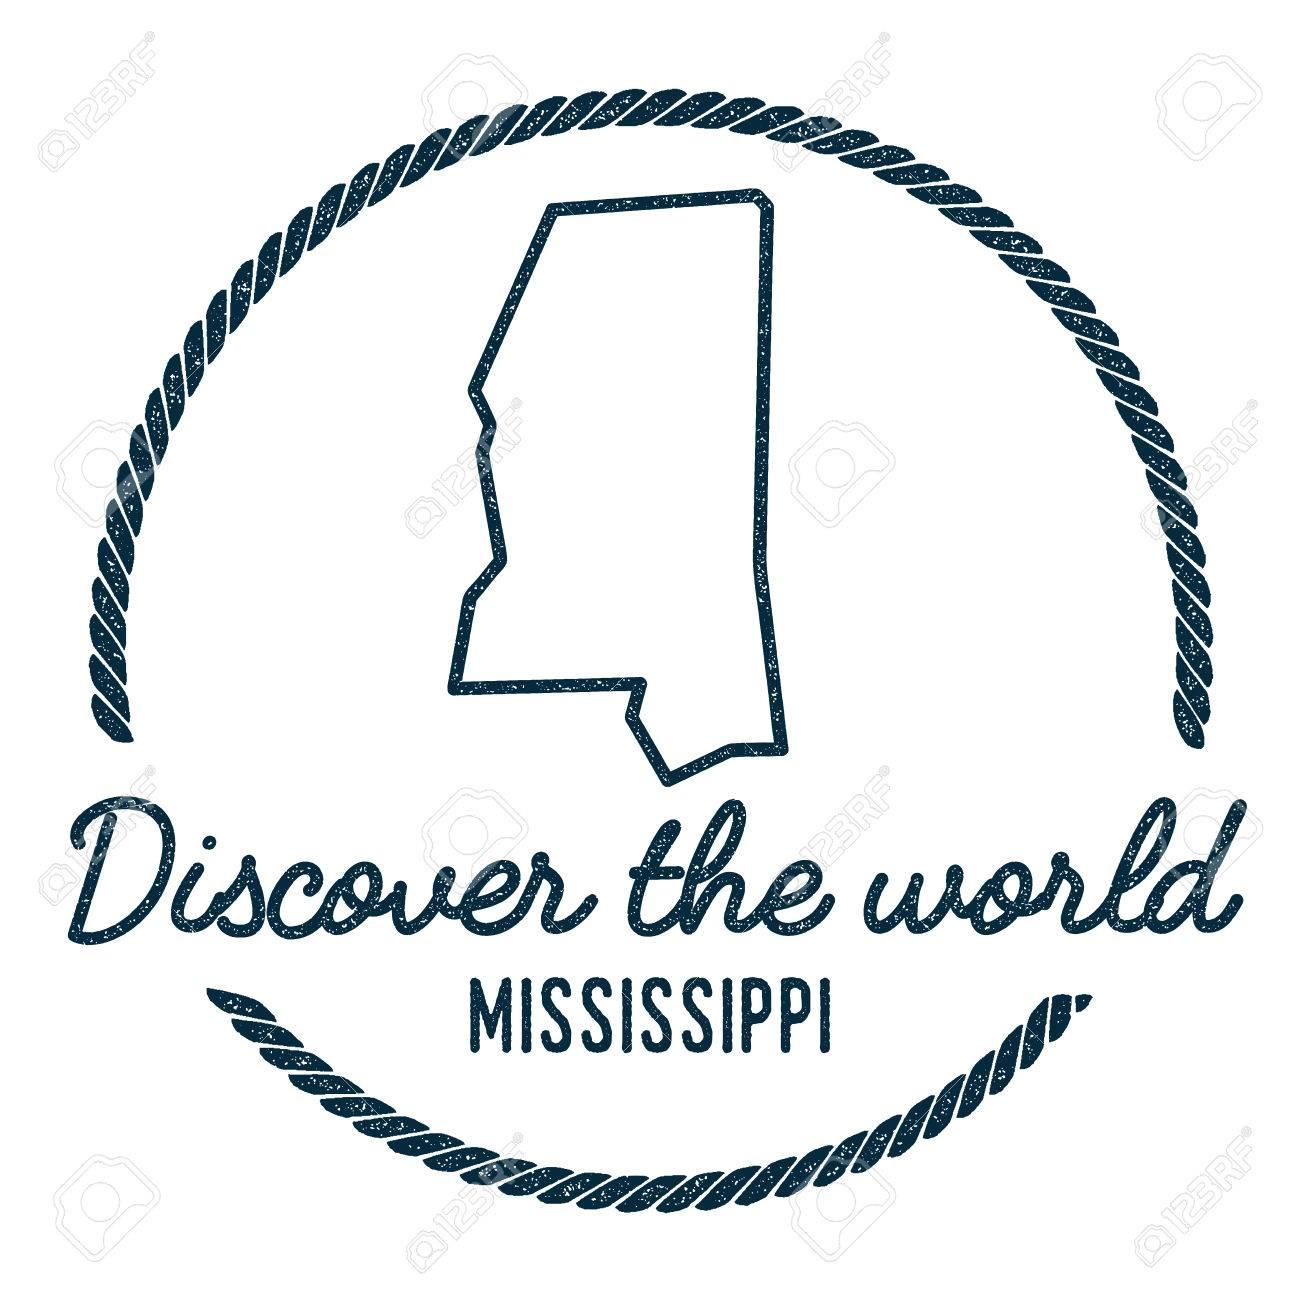 Mississippi State Map Outline.Mississippi Map Outline Vintage Discover The World Rubber Stamp